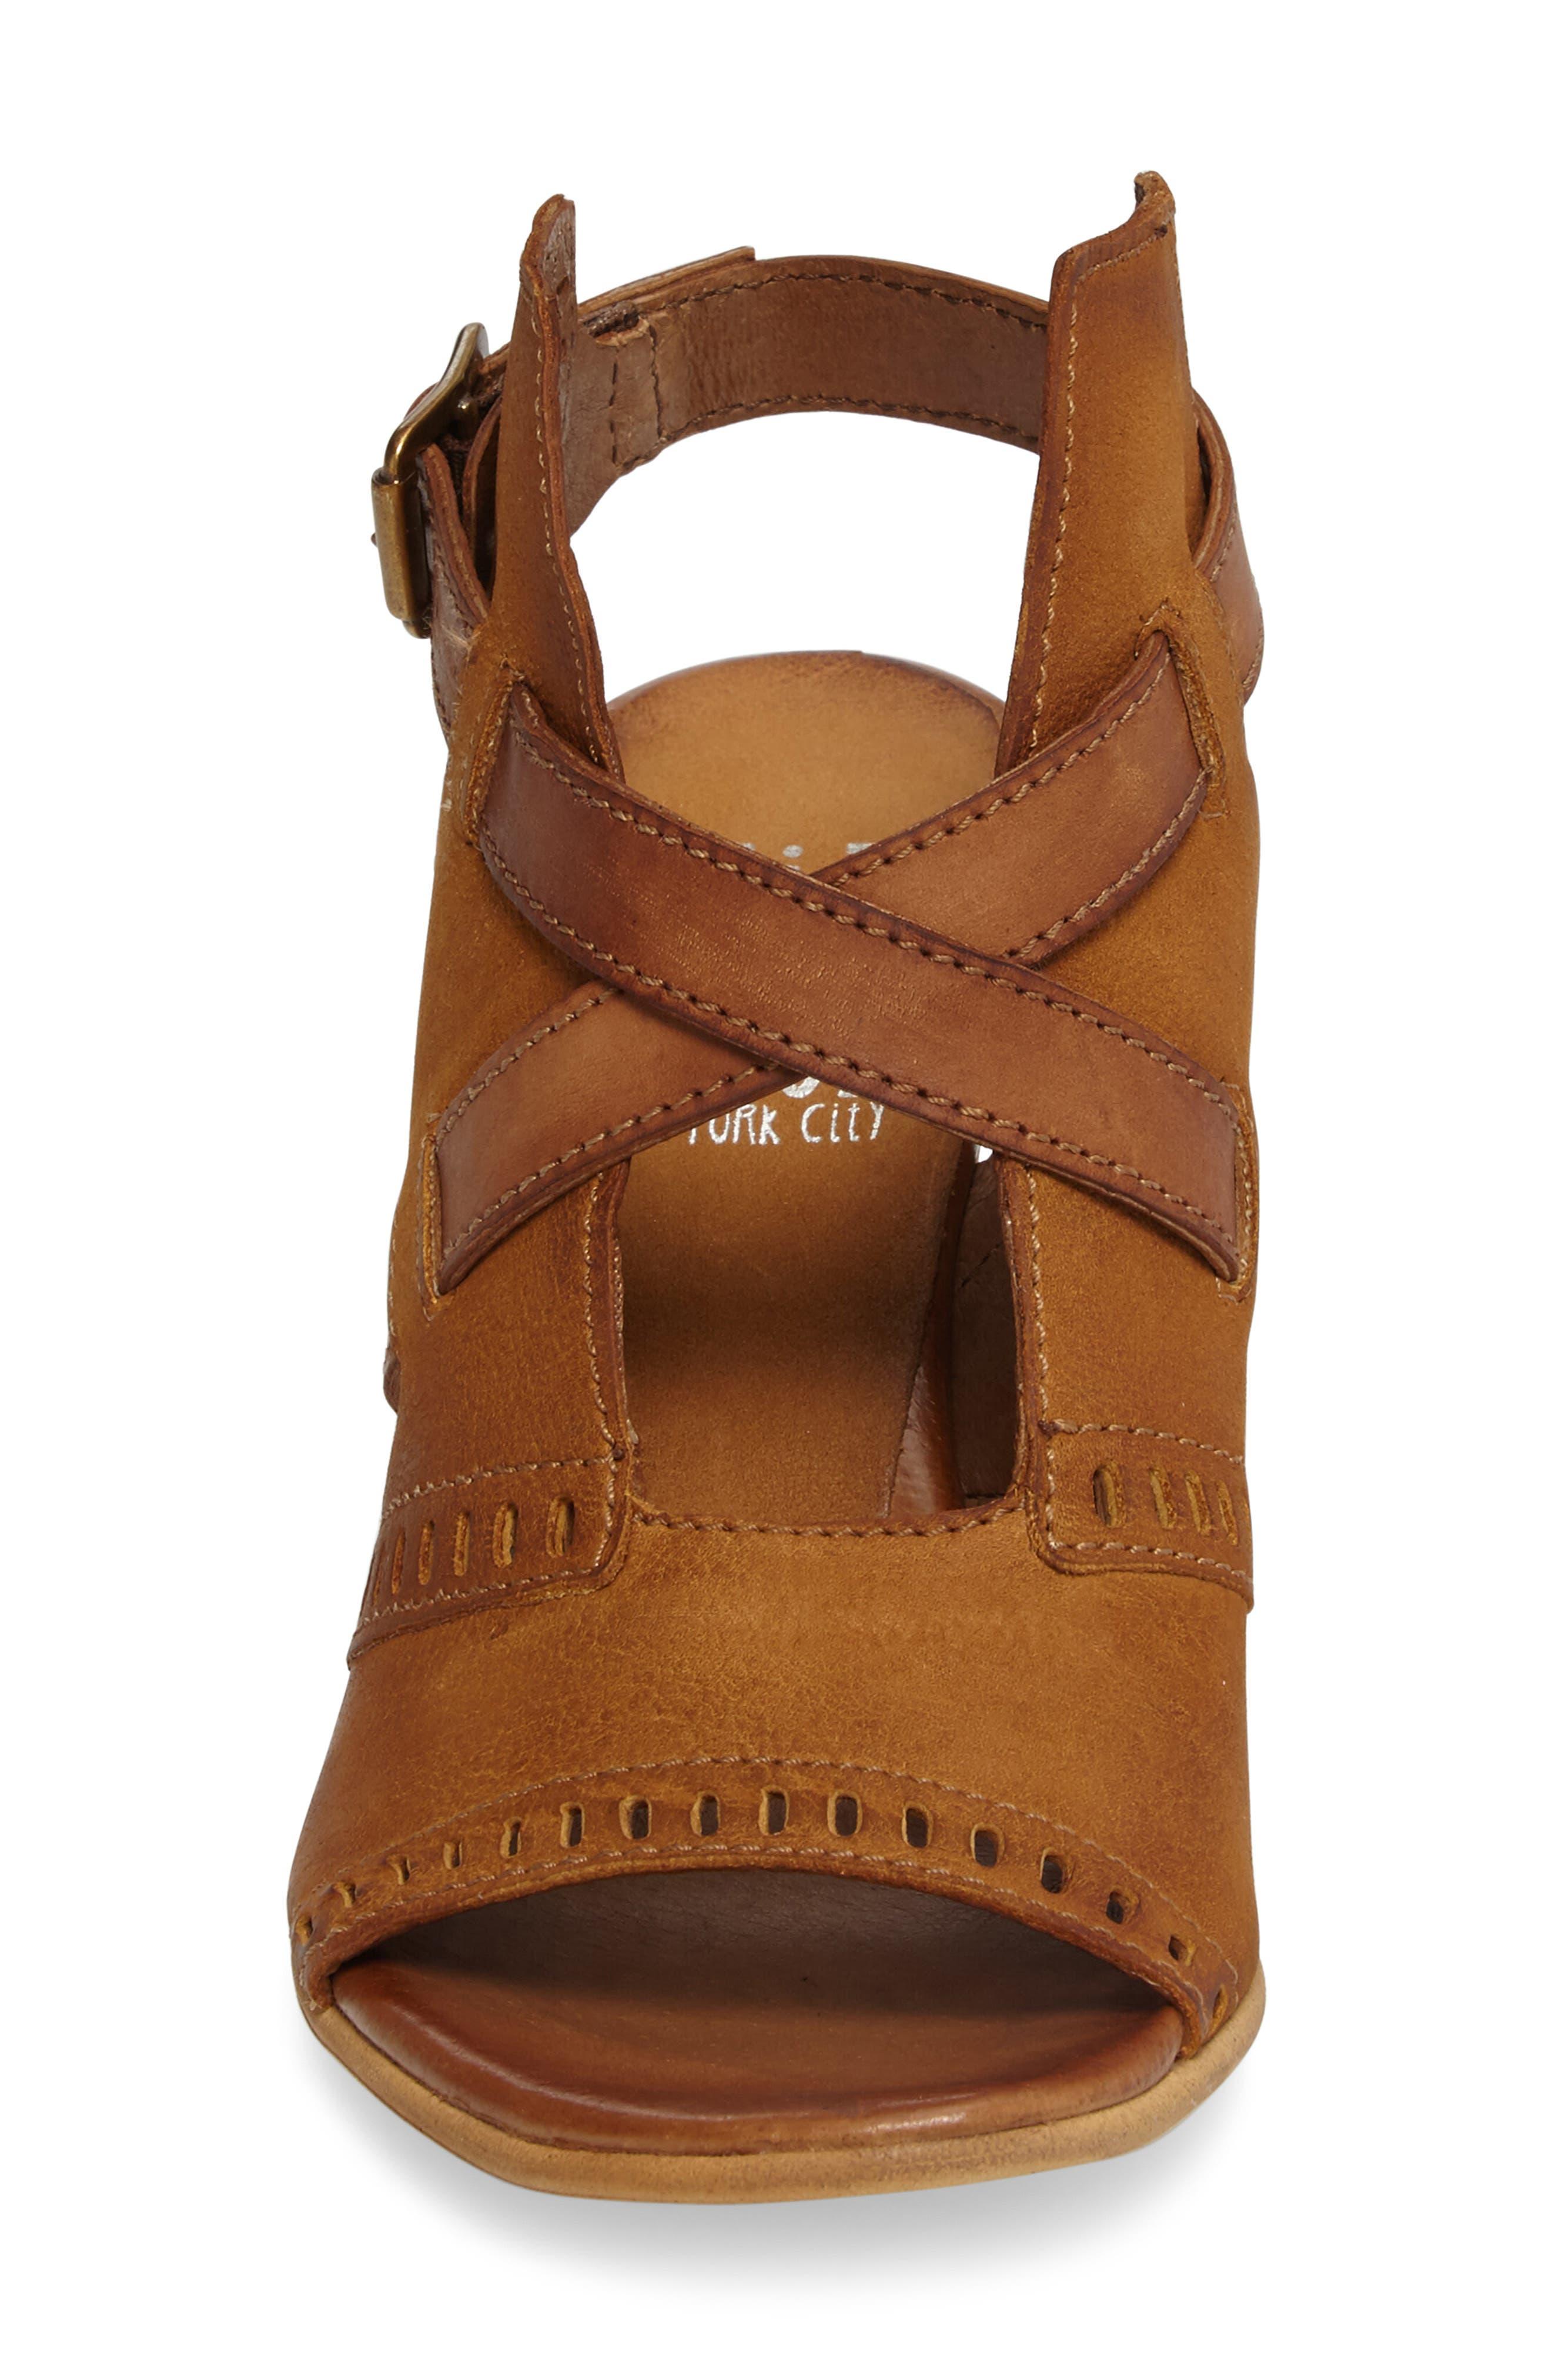 Kipling Perforated Sandal,                             Alternate thumbnail 15, color,